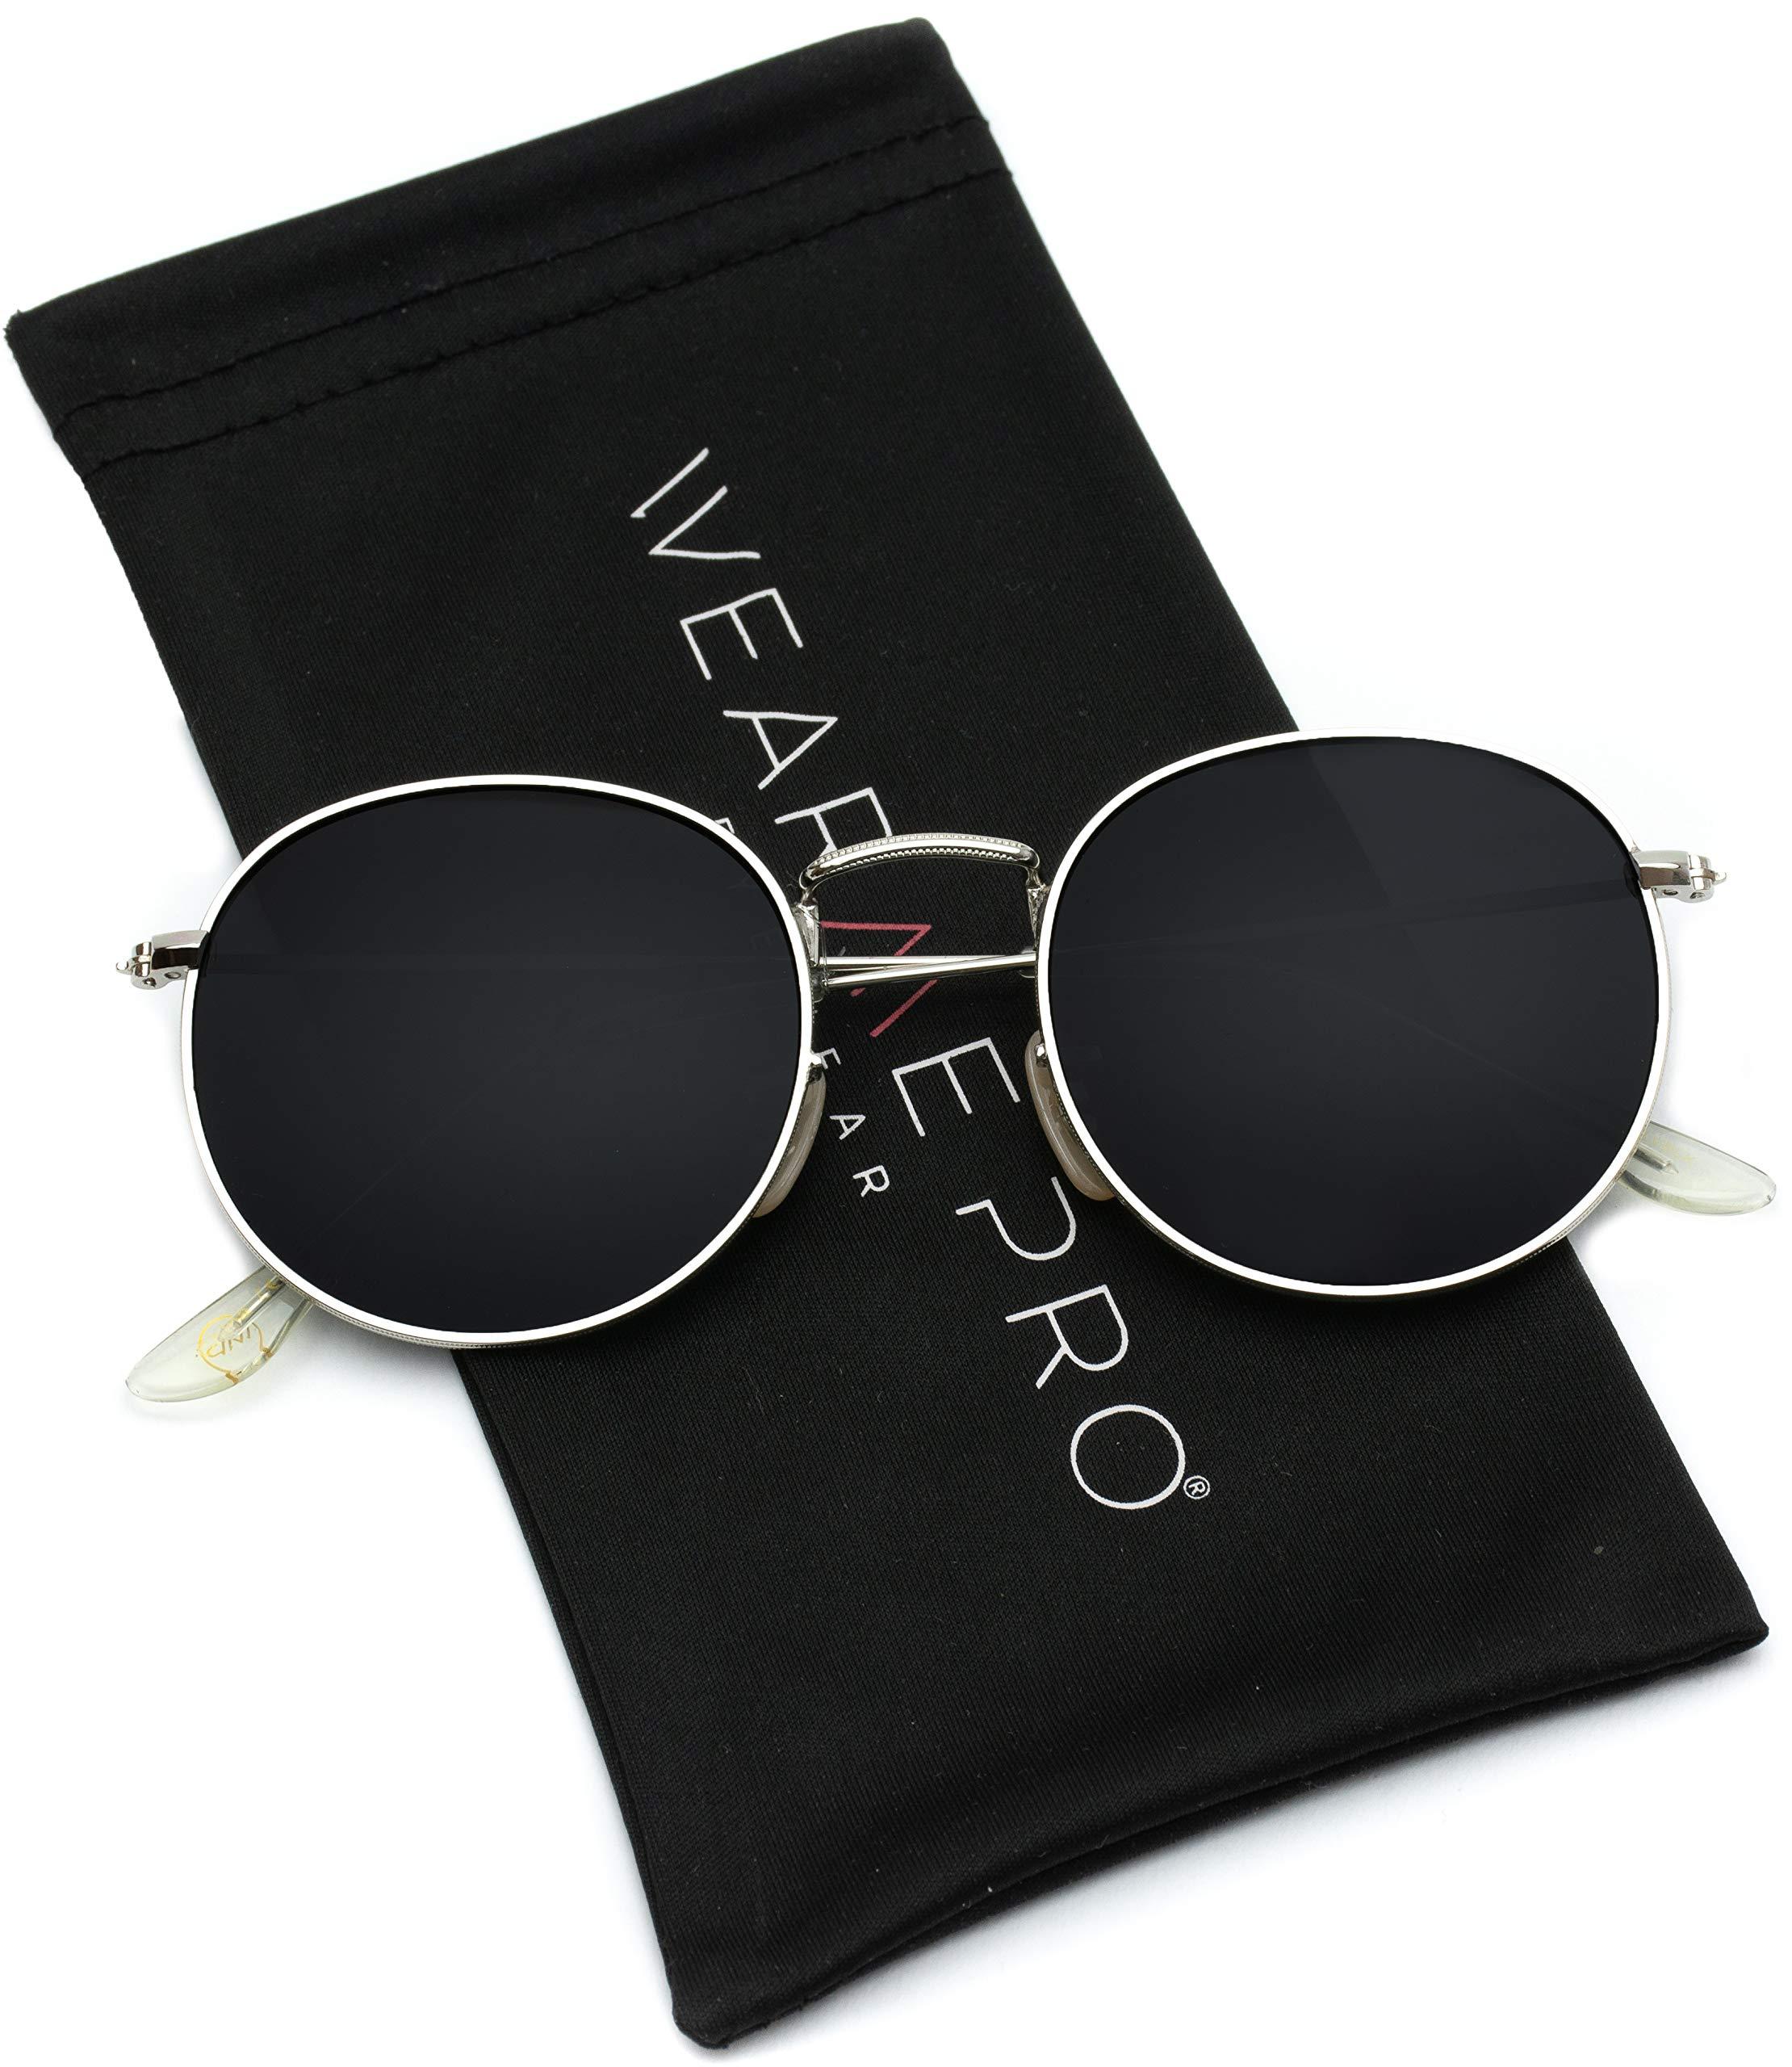 WearMe Pro - Reflective Lens Round Trendy Sunglasses (Silver Frame/Black Lens, 51)